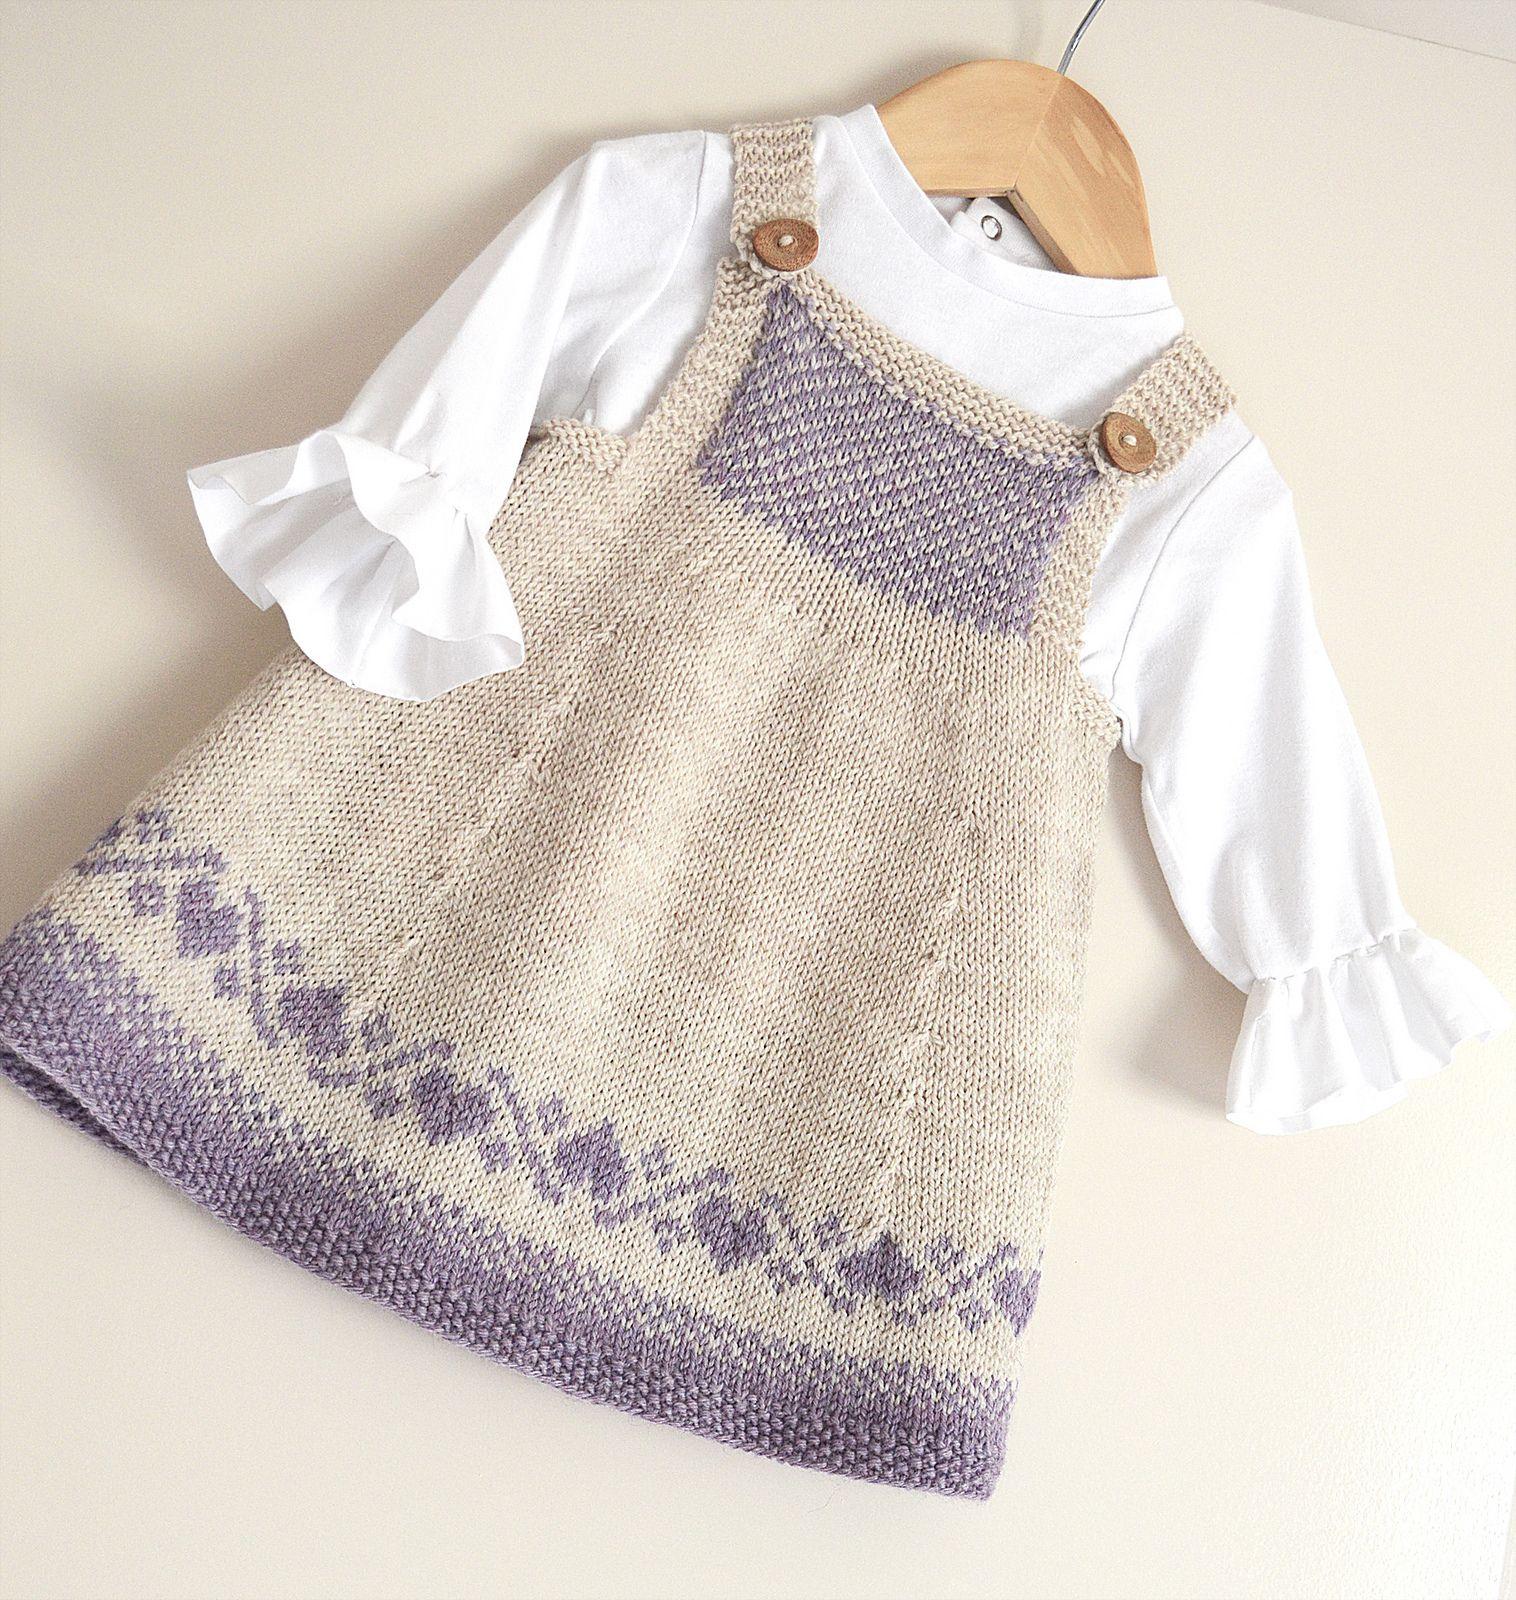 Luv U Forever Pinafore Dress pattern by OGE Knitwear Designs